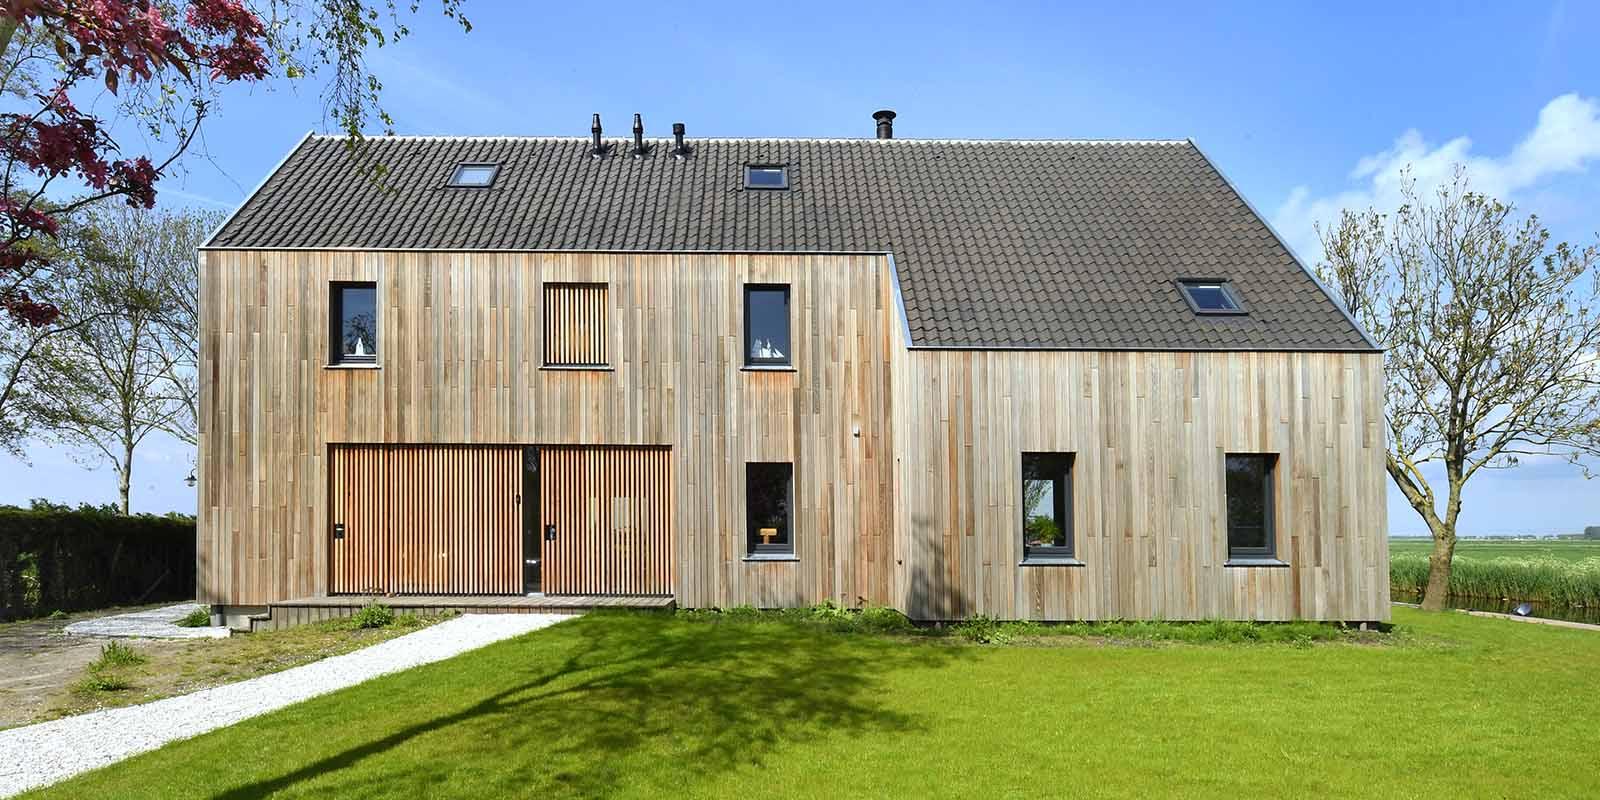 moderne schuurwoning | Hoyt Architecten, the art of living